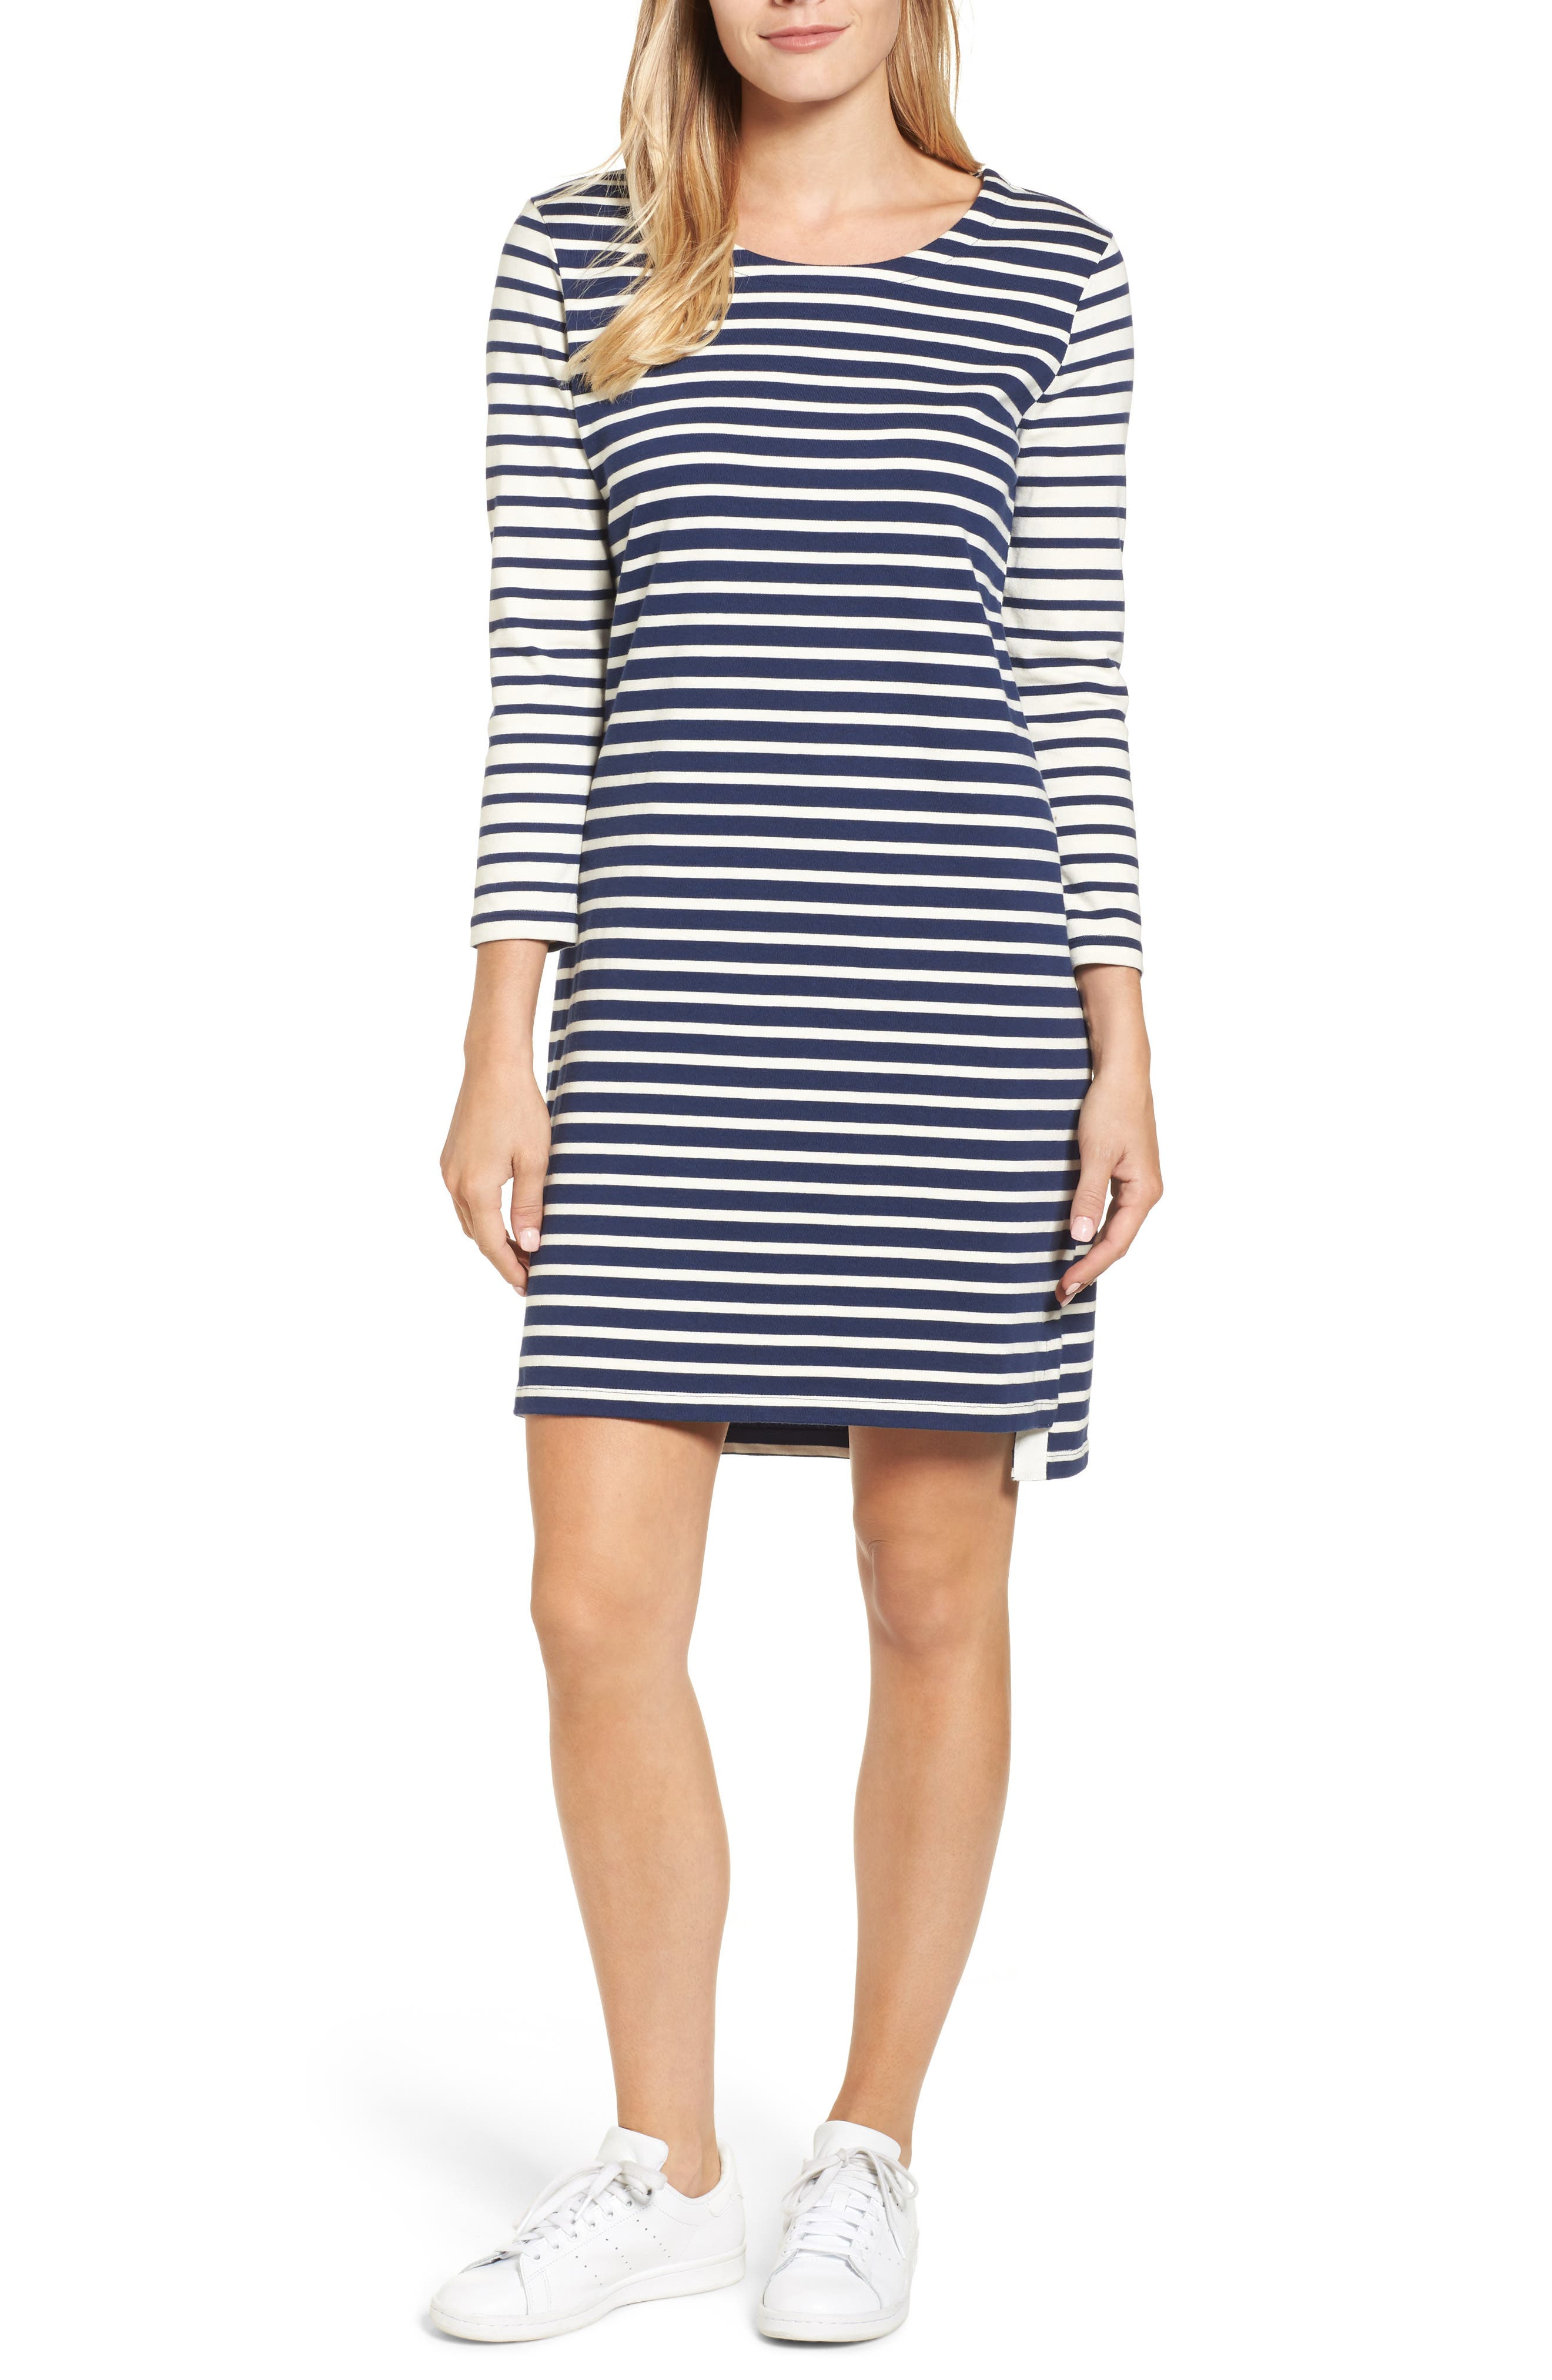 Main Image - vineyard vines Mixed Stripe Knit Dress